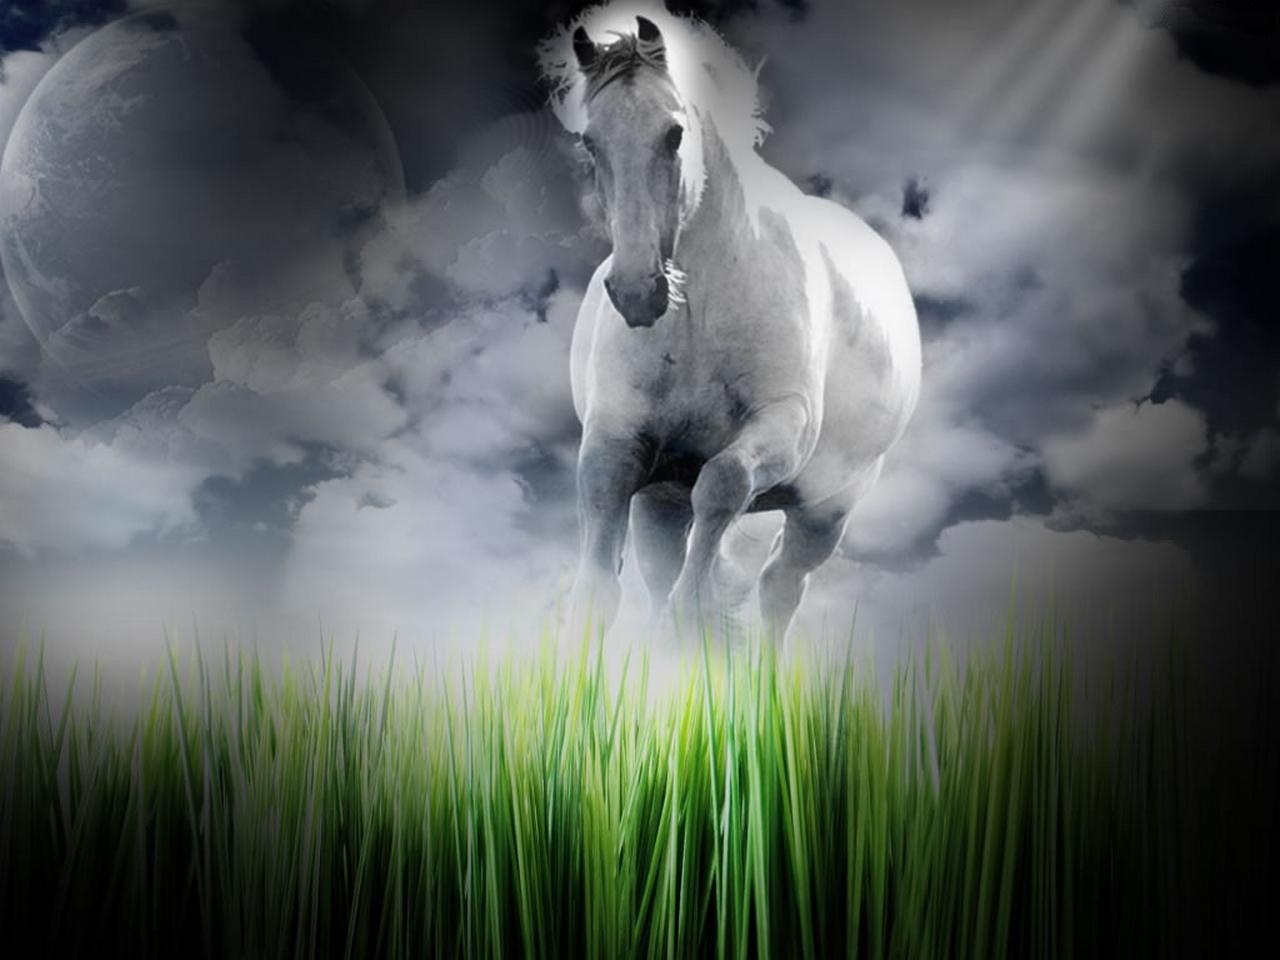 8k Animal Wallpaper Download: Animal Digital Art Wallpapers